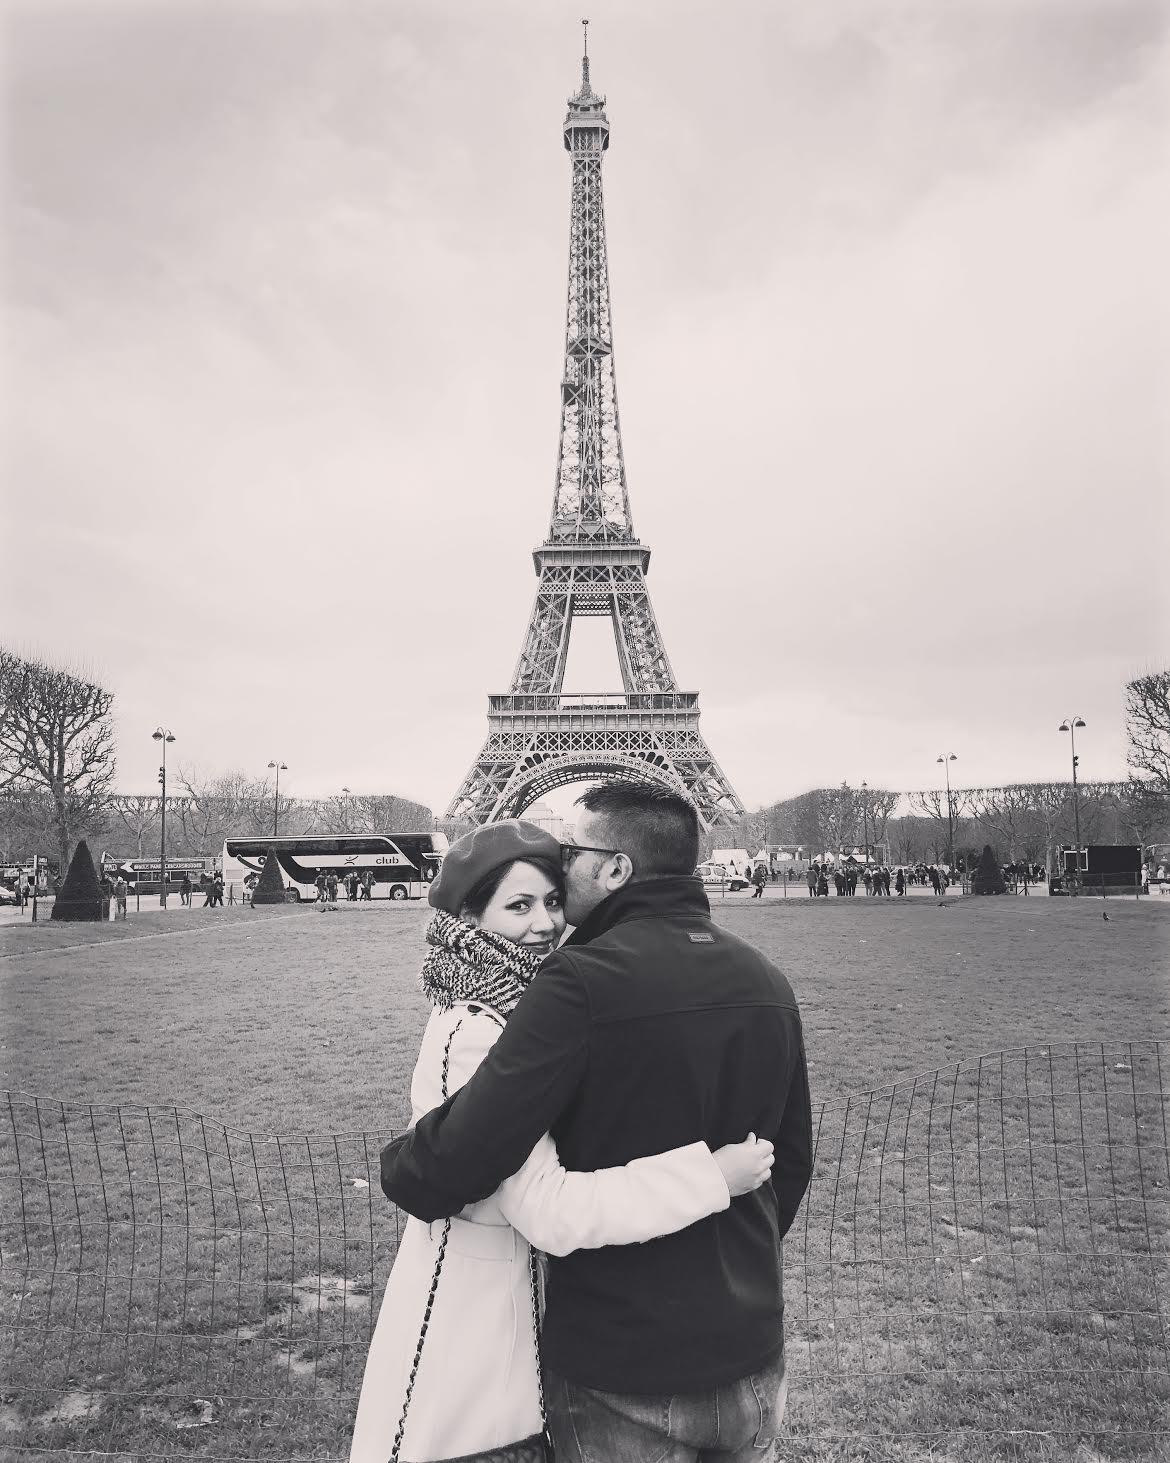 Muslim-travel-tips-romance-Eiffel-Tower.jpg